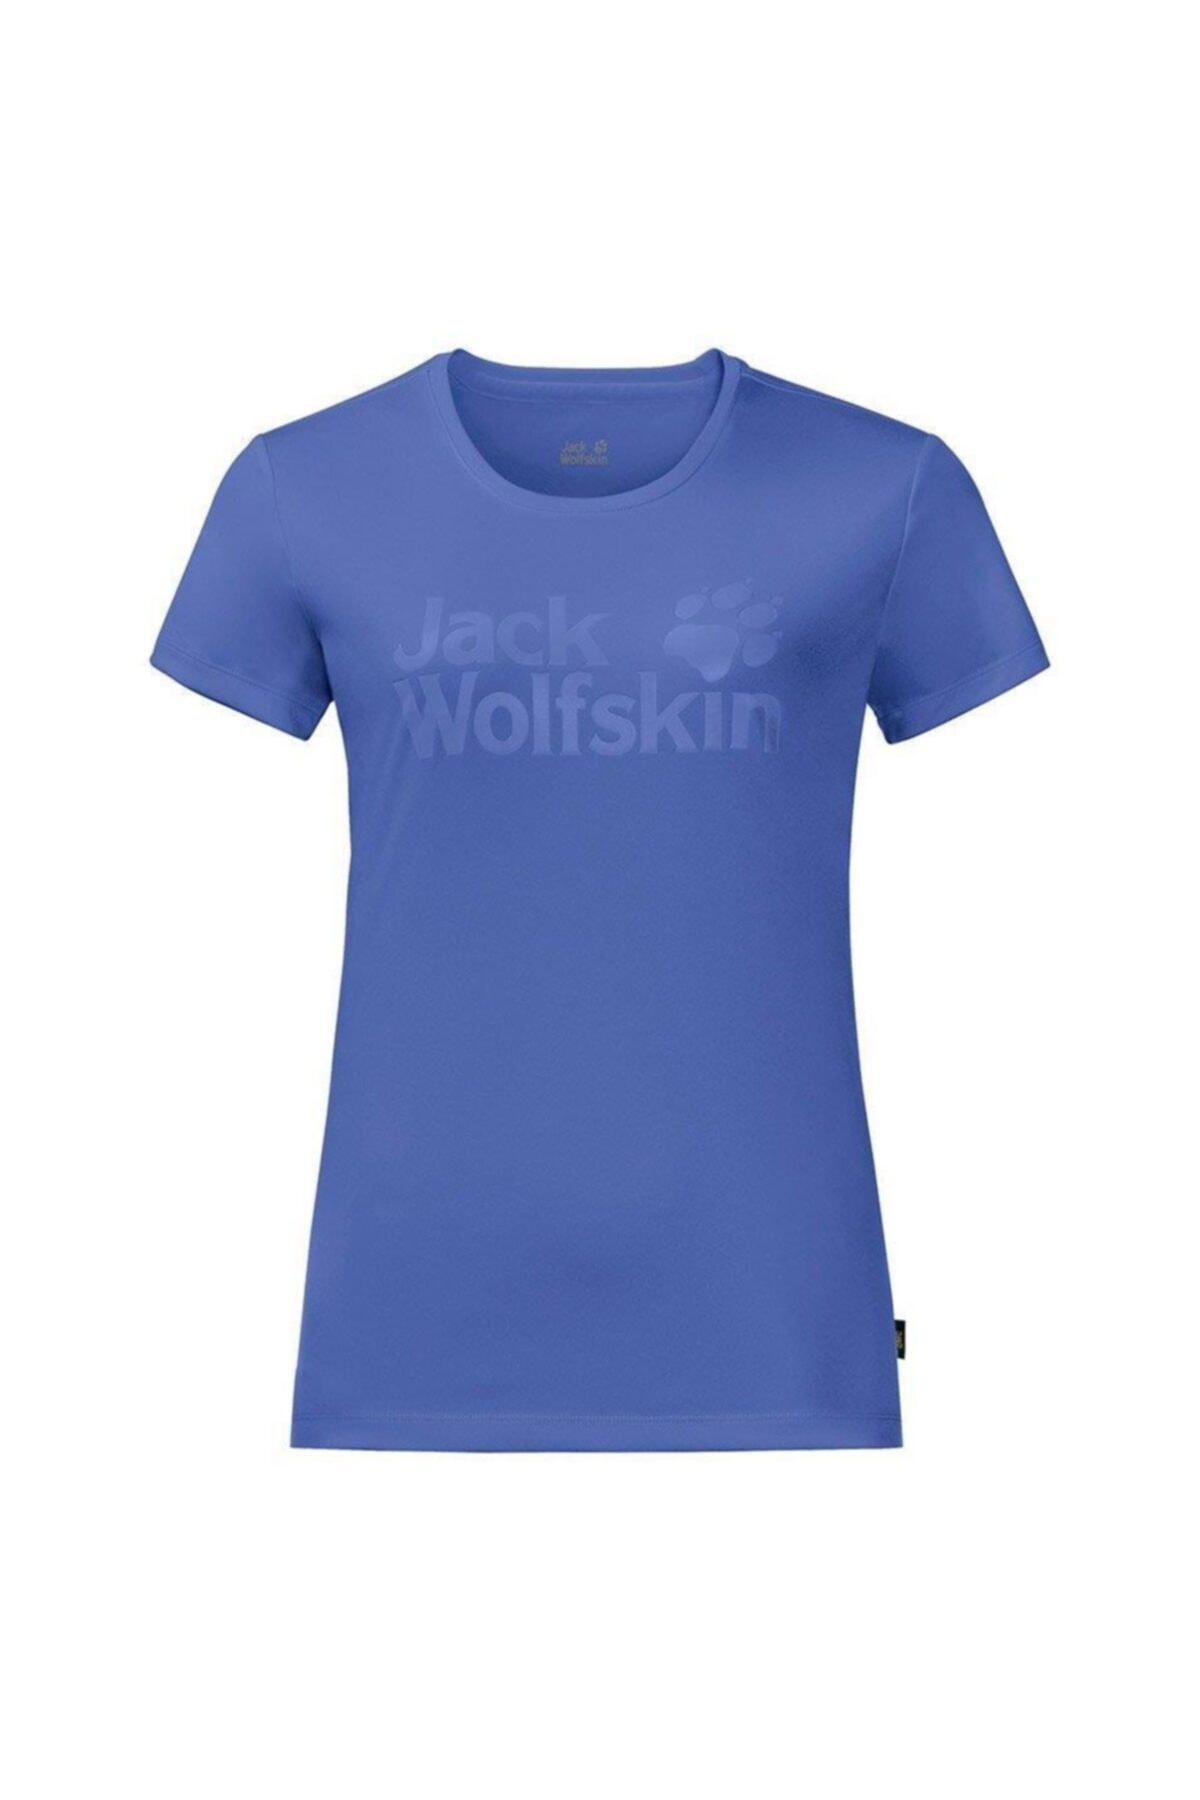 Jack Wolfskin Rock Chill Logo Kadın T-shirt - 1805541-1098 1